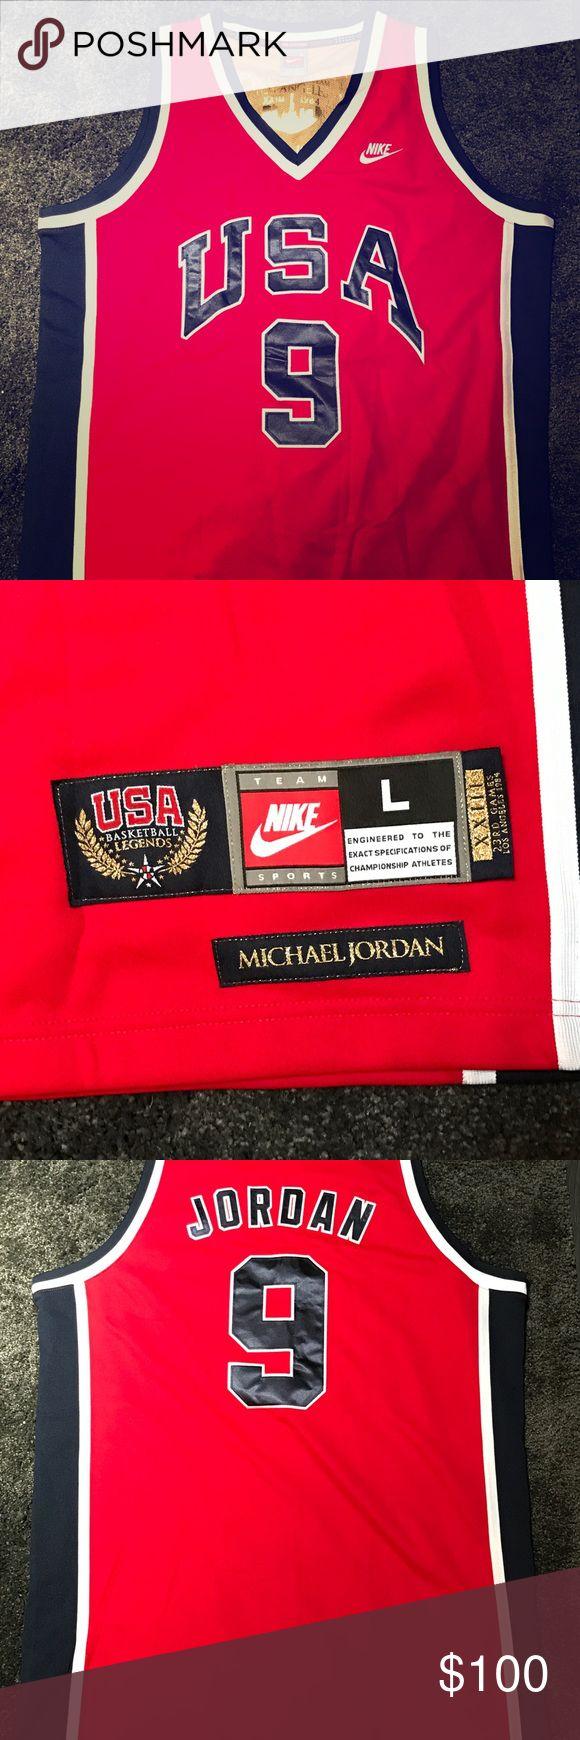 more photos a4e2b 155c9 1984 olympics team usa 9 michael jordan red swingman jersey